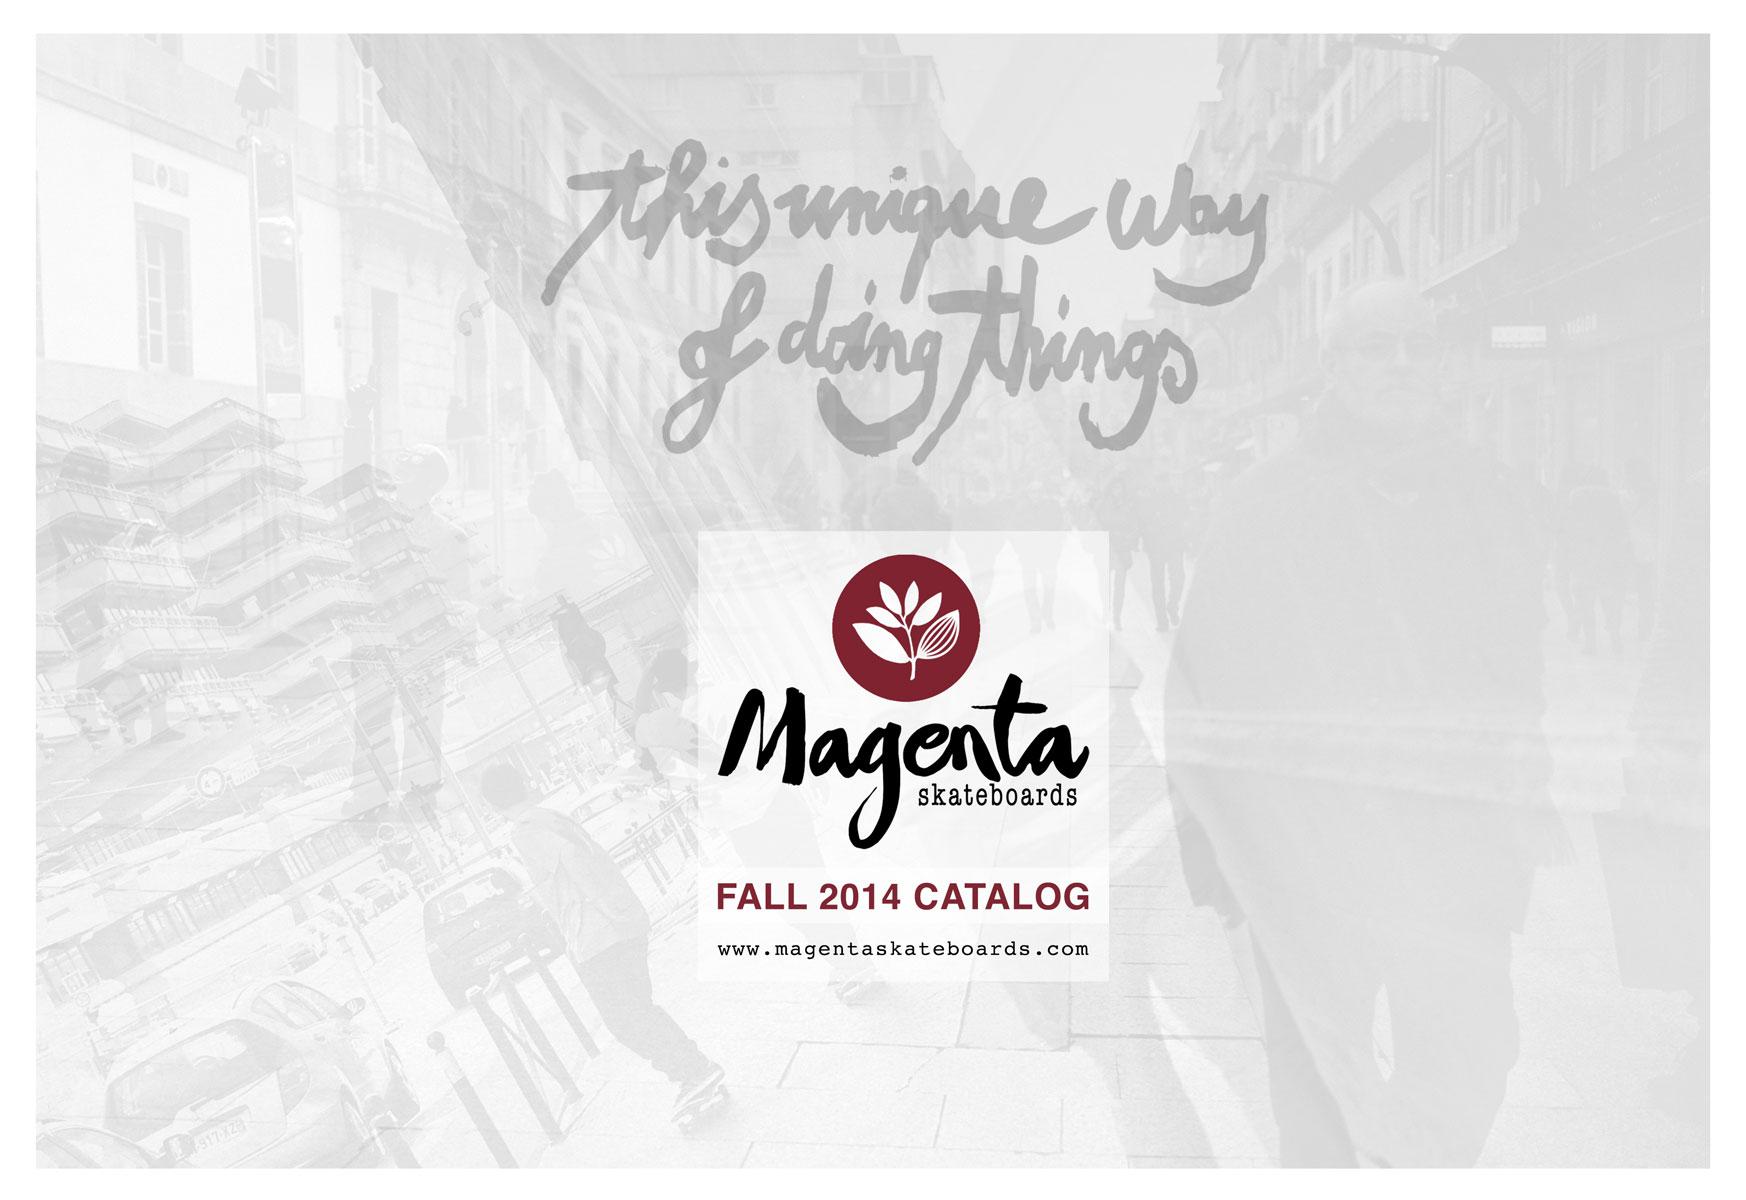 MAGENTA-FA14-CATALOG-page-1